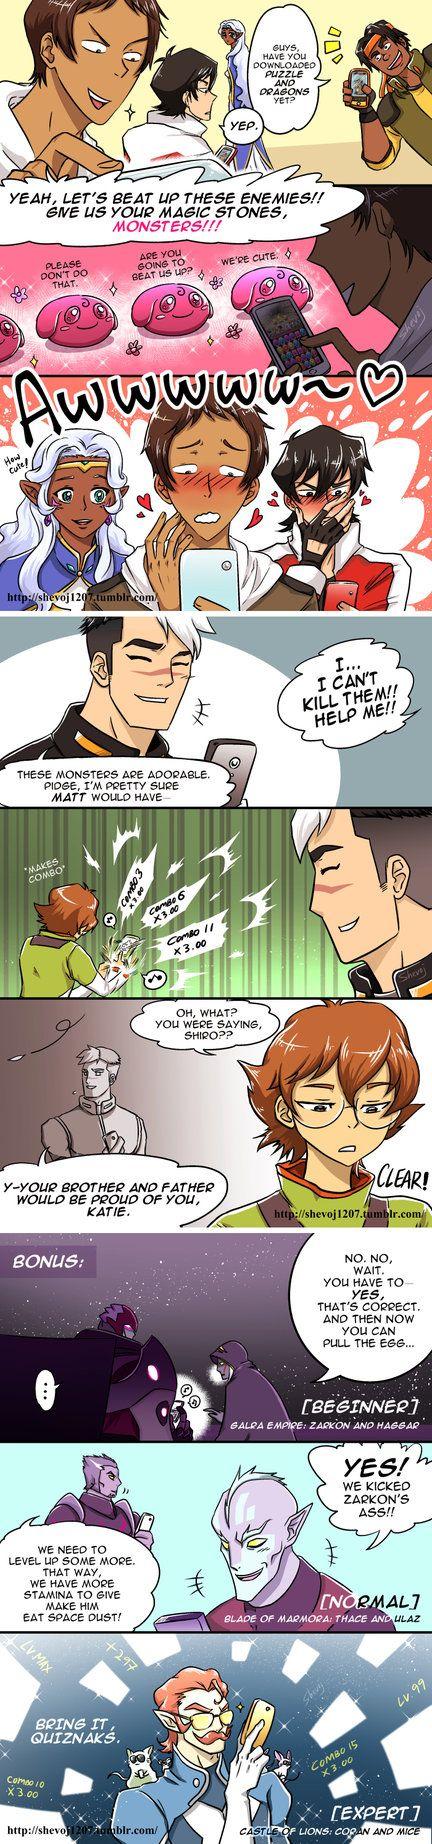 Short Comic - Voltron x PAD by shevoj.deviantart.com on @DeviantArt